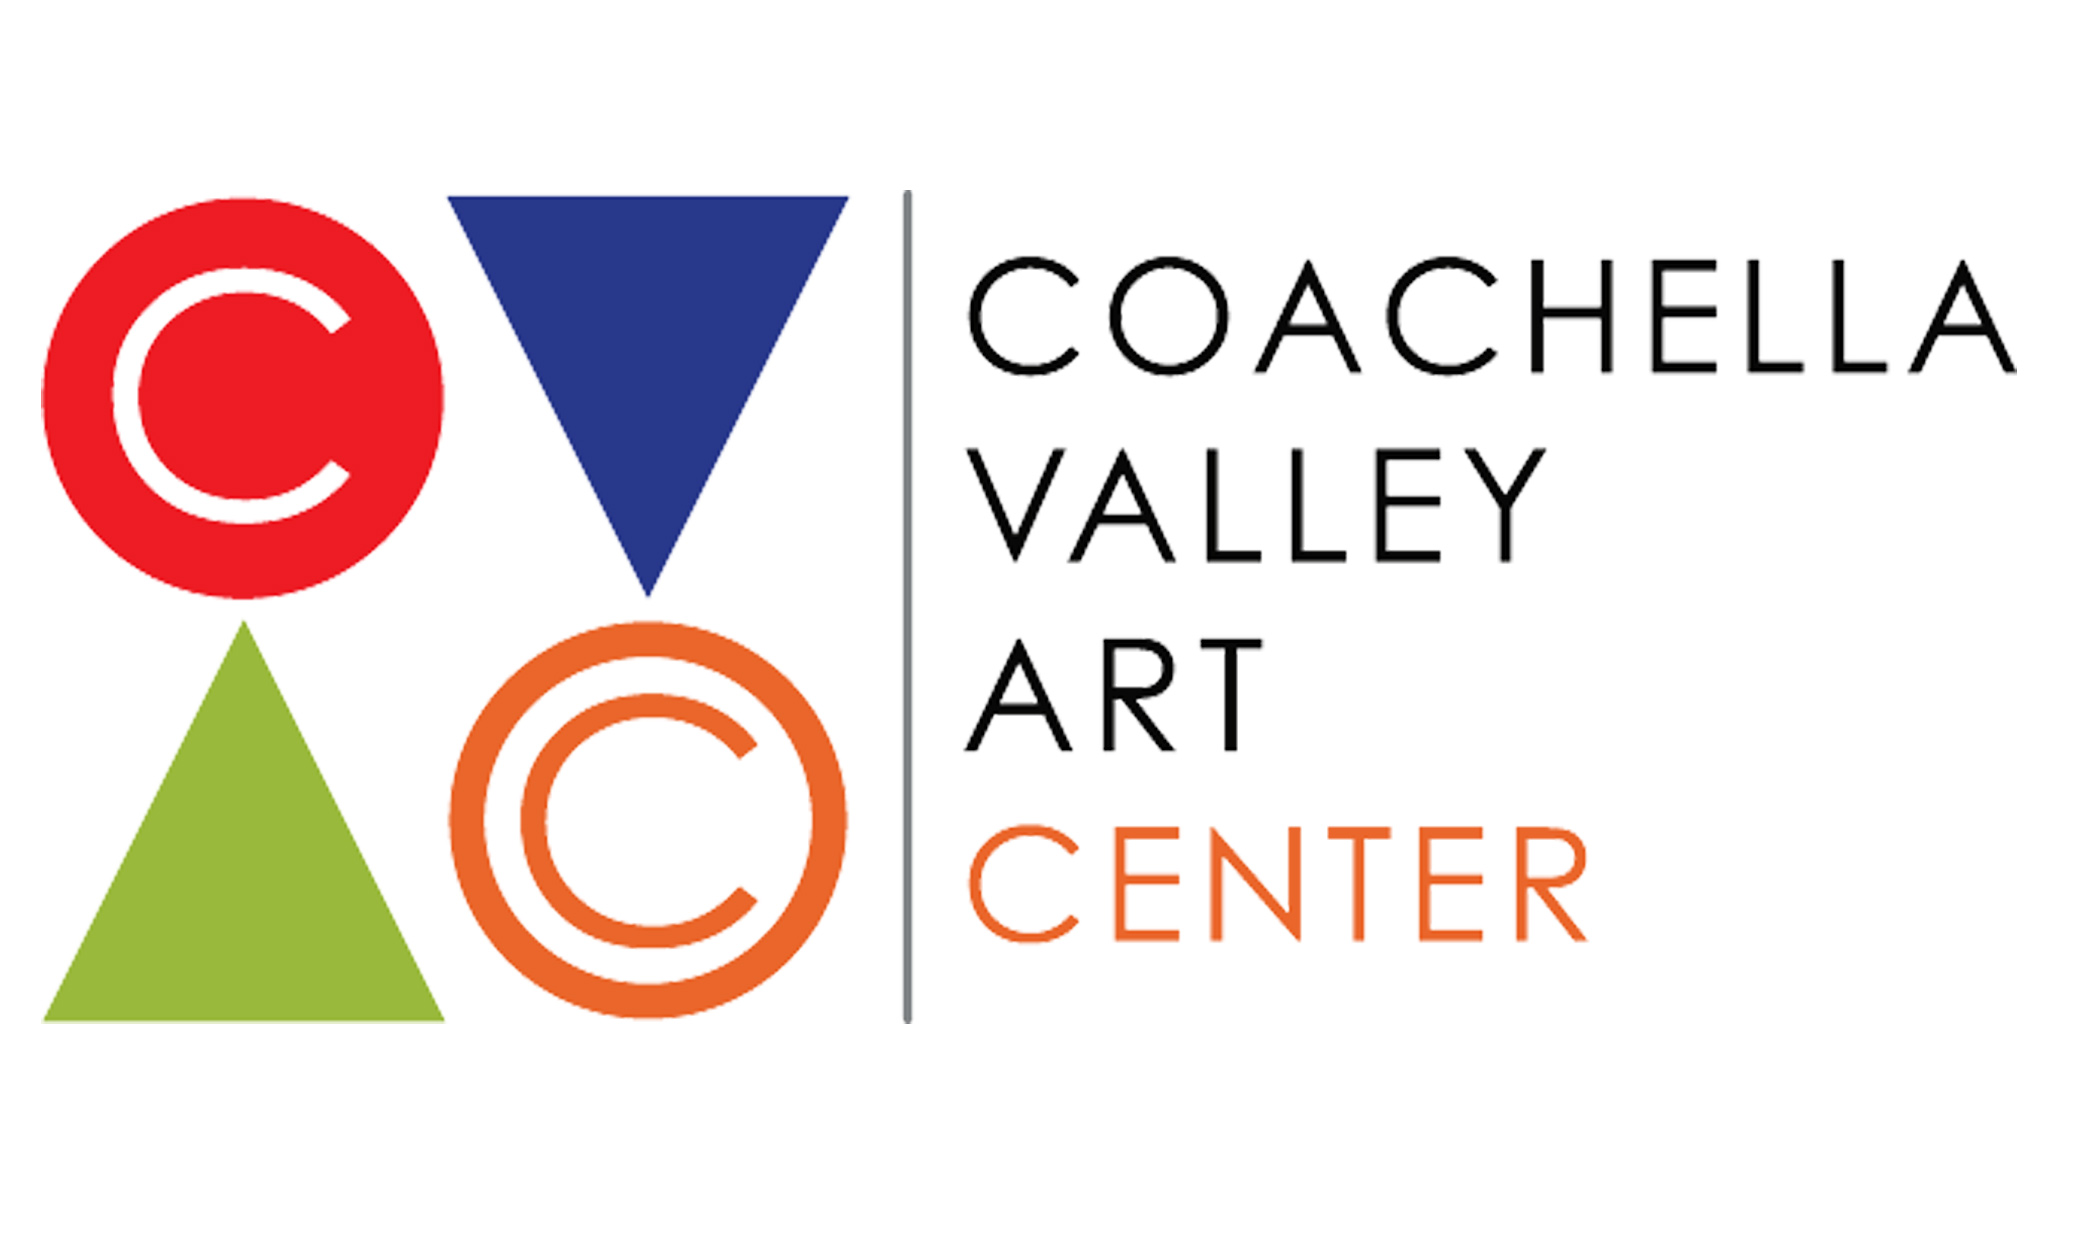 CVAC-logo-sm-2.jpg